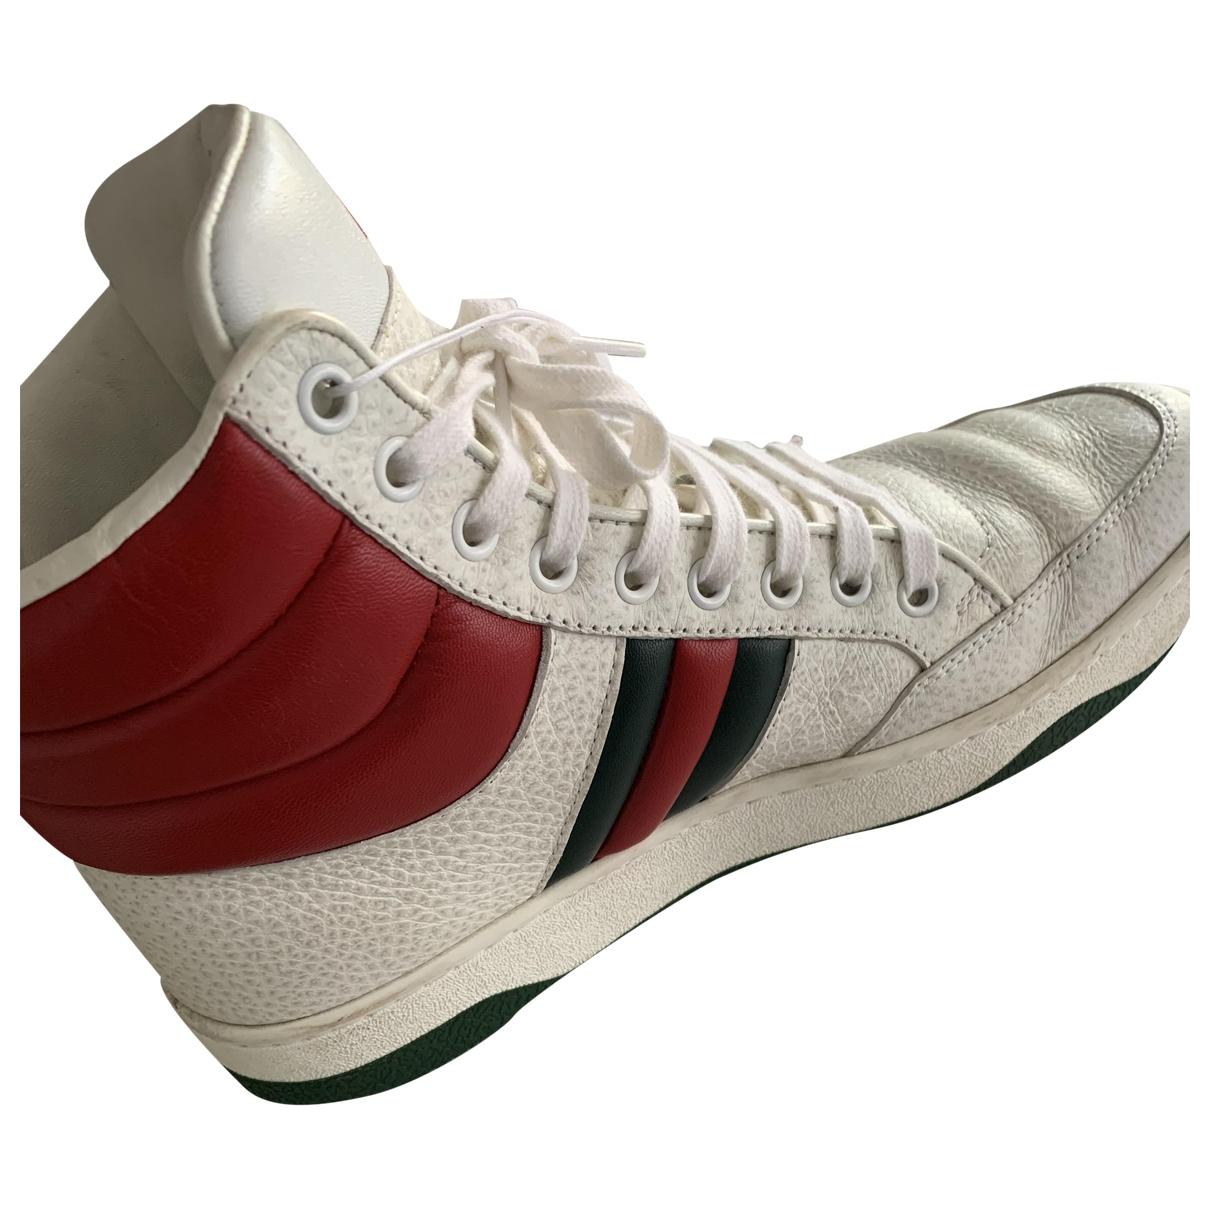 Gucci Gucci Dapper Dan White Leather Trainers for Women 38.5 EU